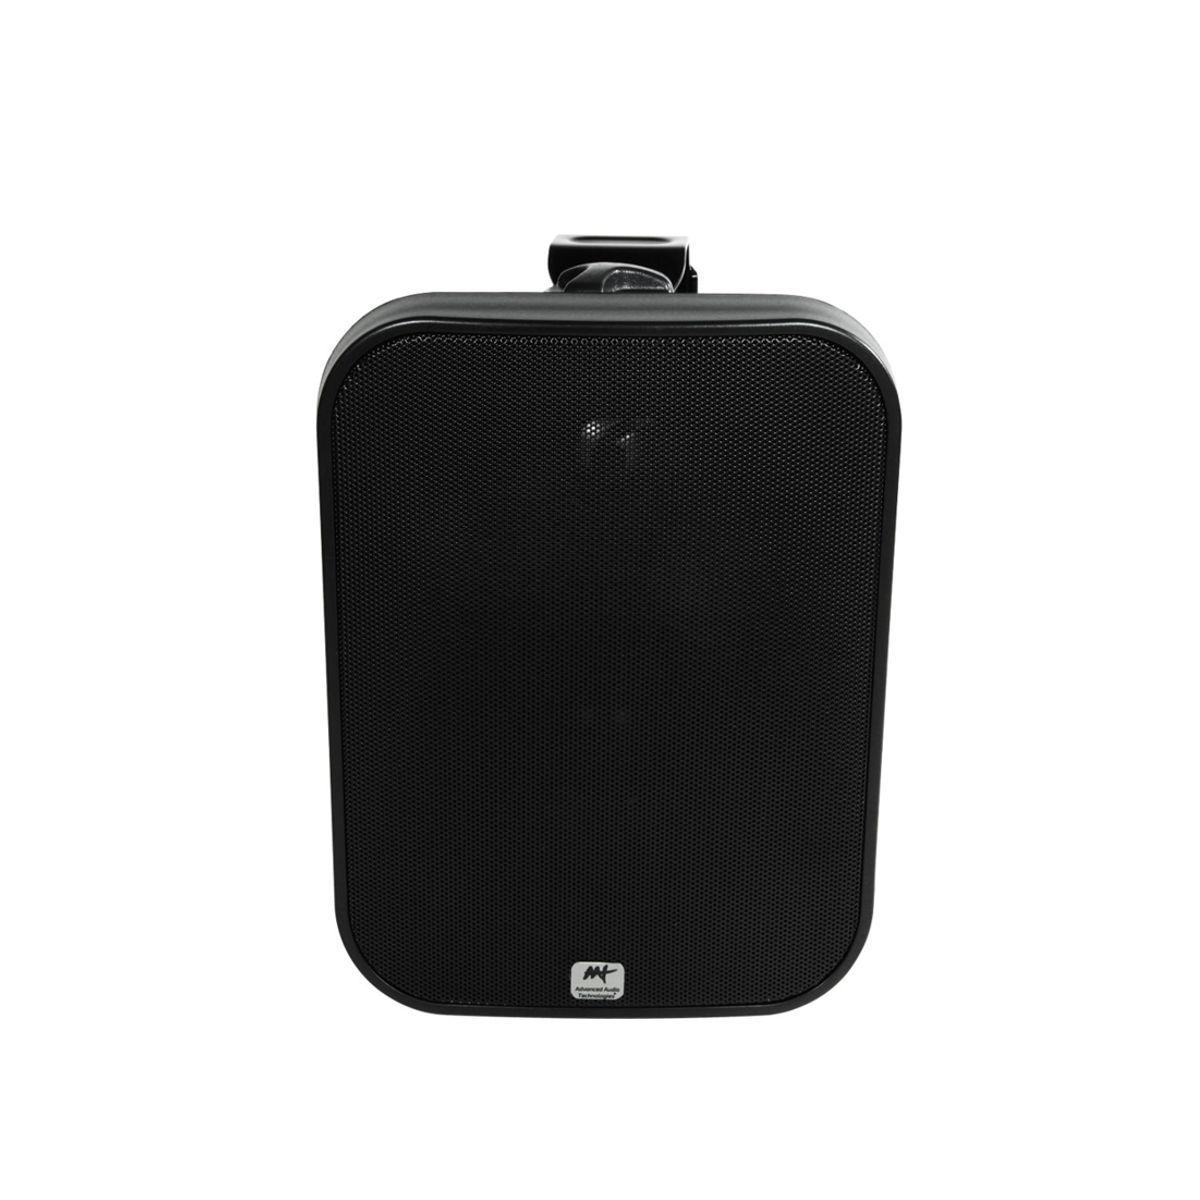 Caixa de Som Ambiente Externo / Interno Selada 120W OS120-IP56 AAT (PAR)